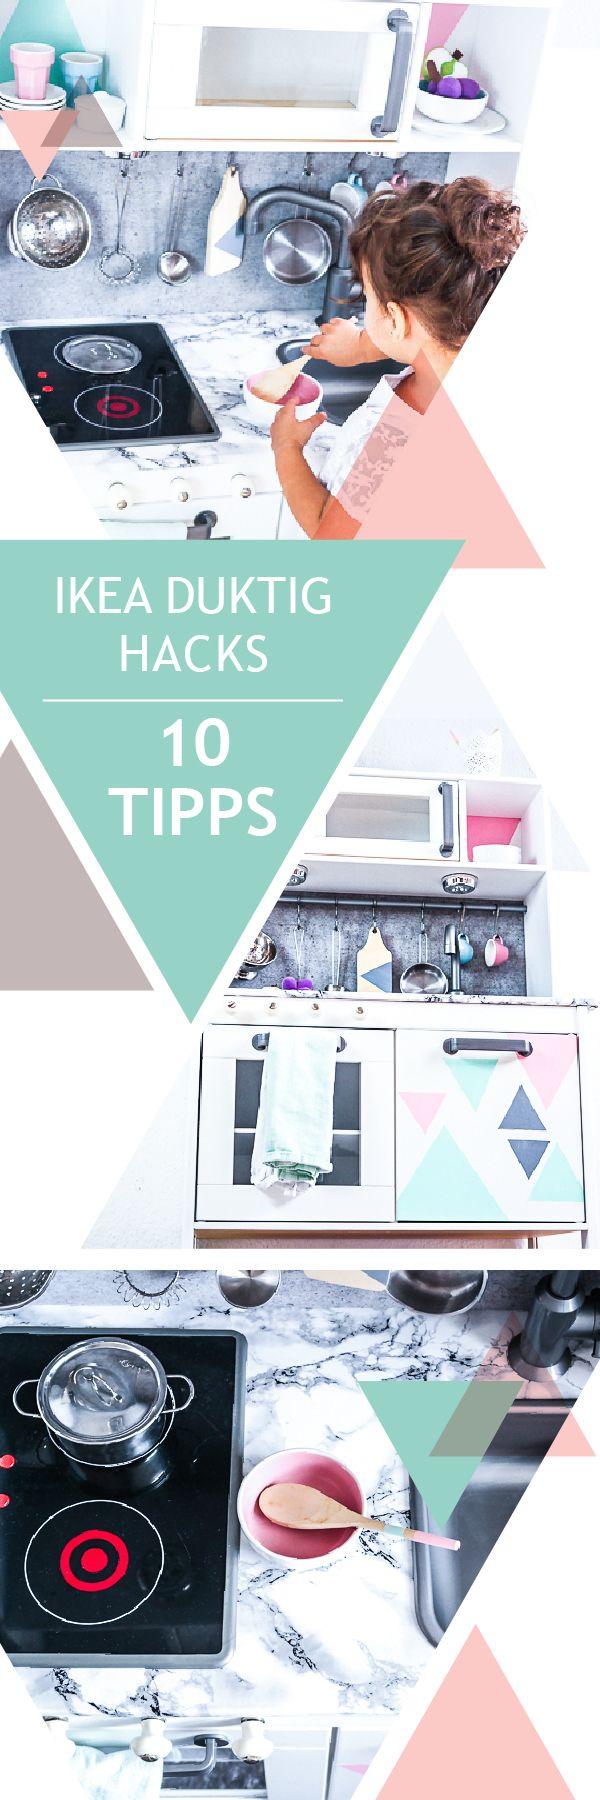 Innovativ IKEA DUKTIG Kinderküche pimpen – 10 einfache DIY Tricks für eure  NS33